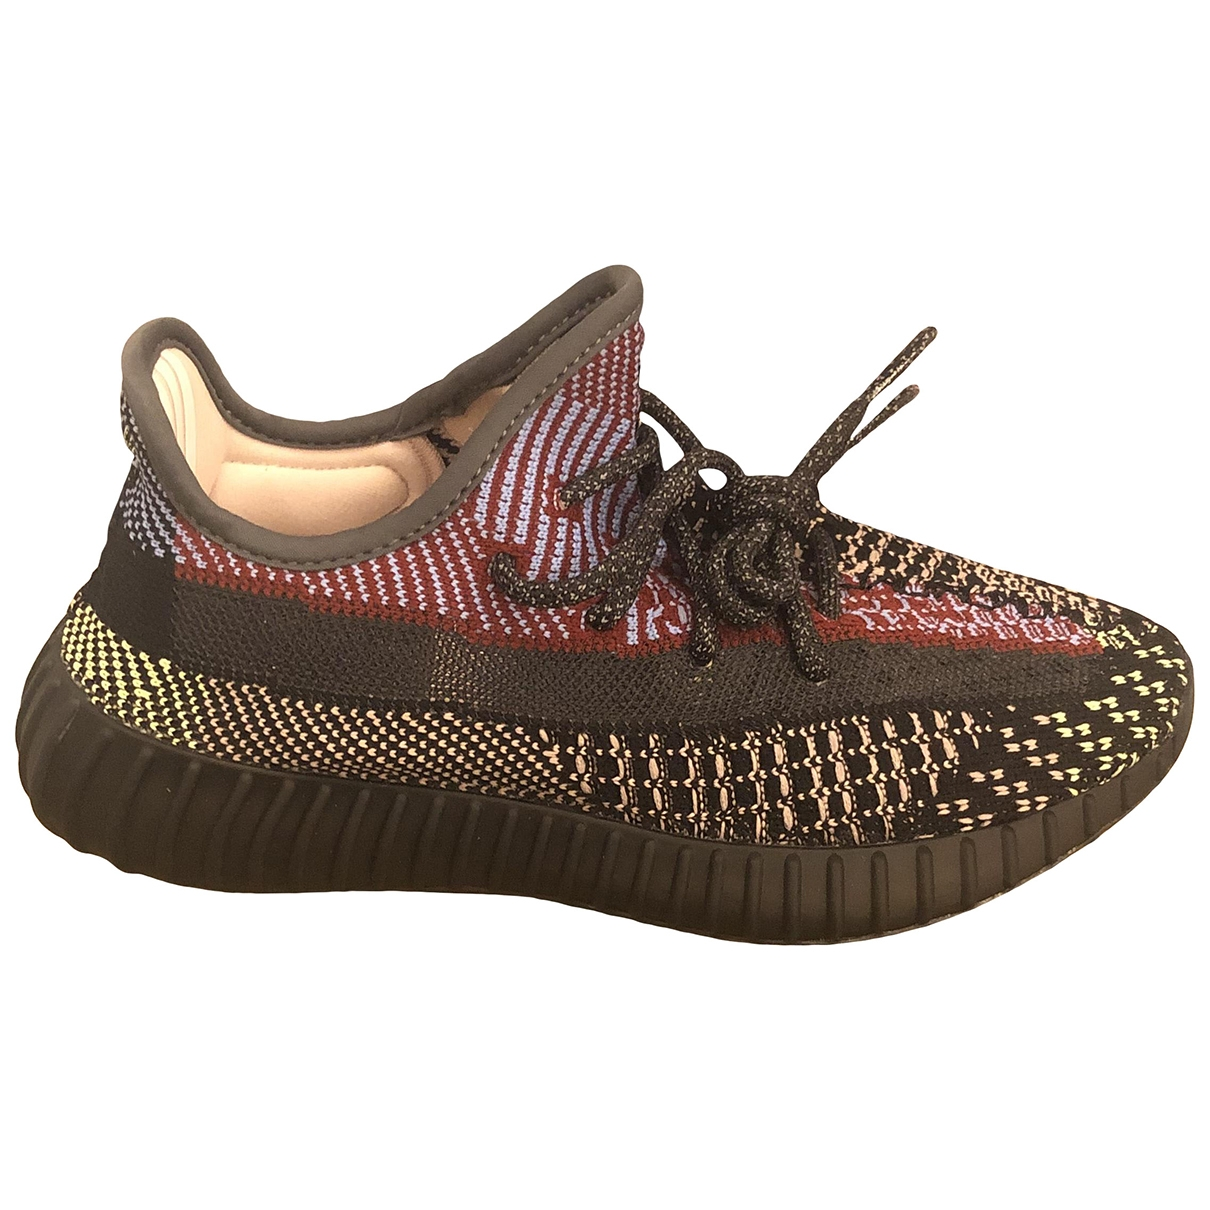 Deportivas Boost 350 V2 de Lona Yeezy X Adidas